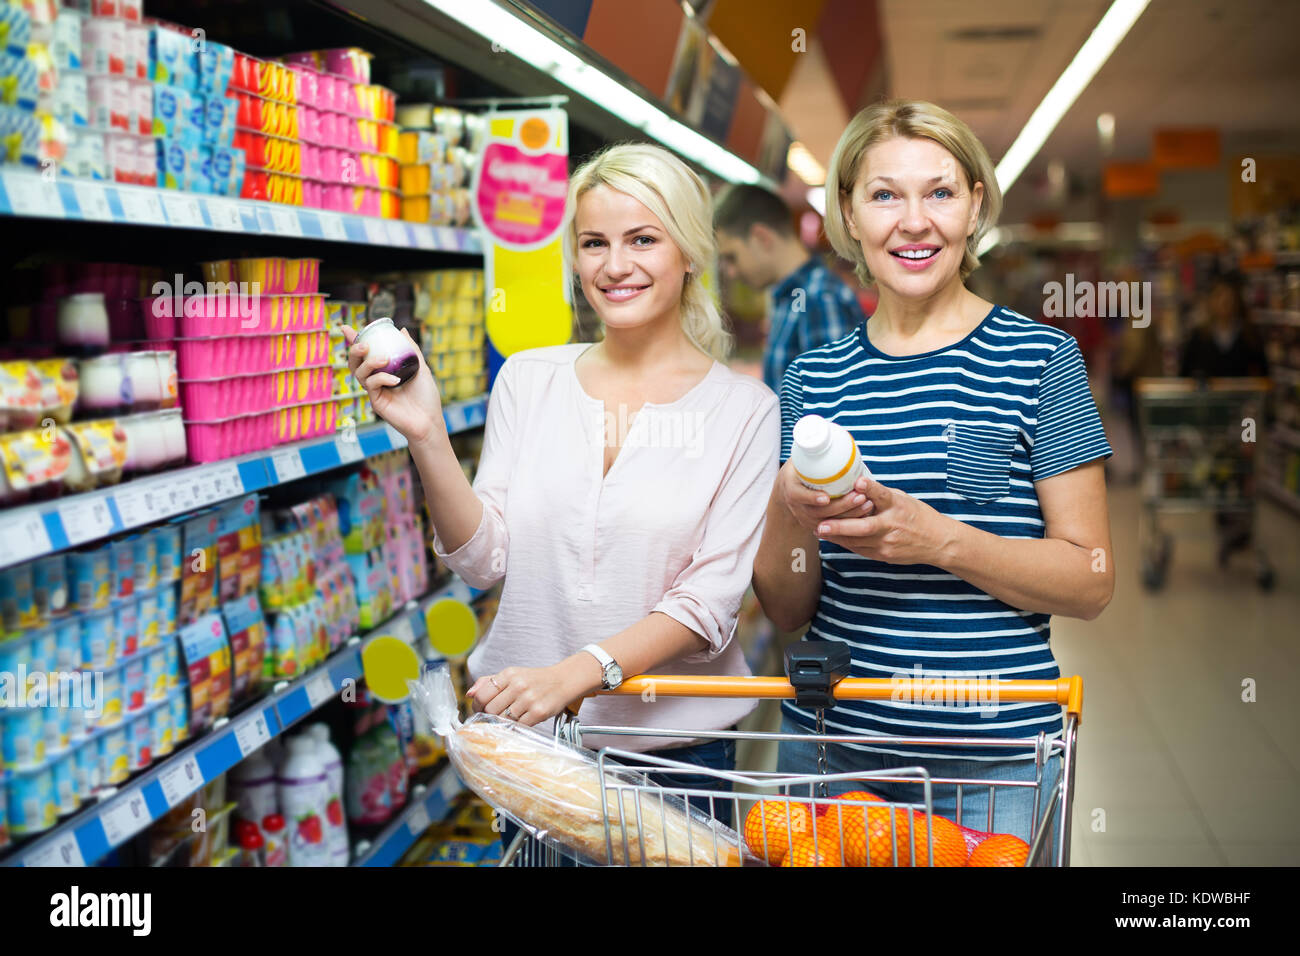 creamery asian personals American singlesamerican singles cache valley creamery american  asian singlesasian singles dating virtual 314 views free personalsmember free personals ru.